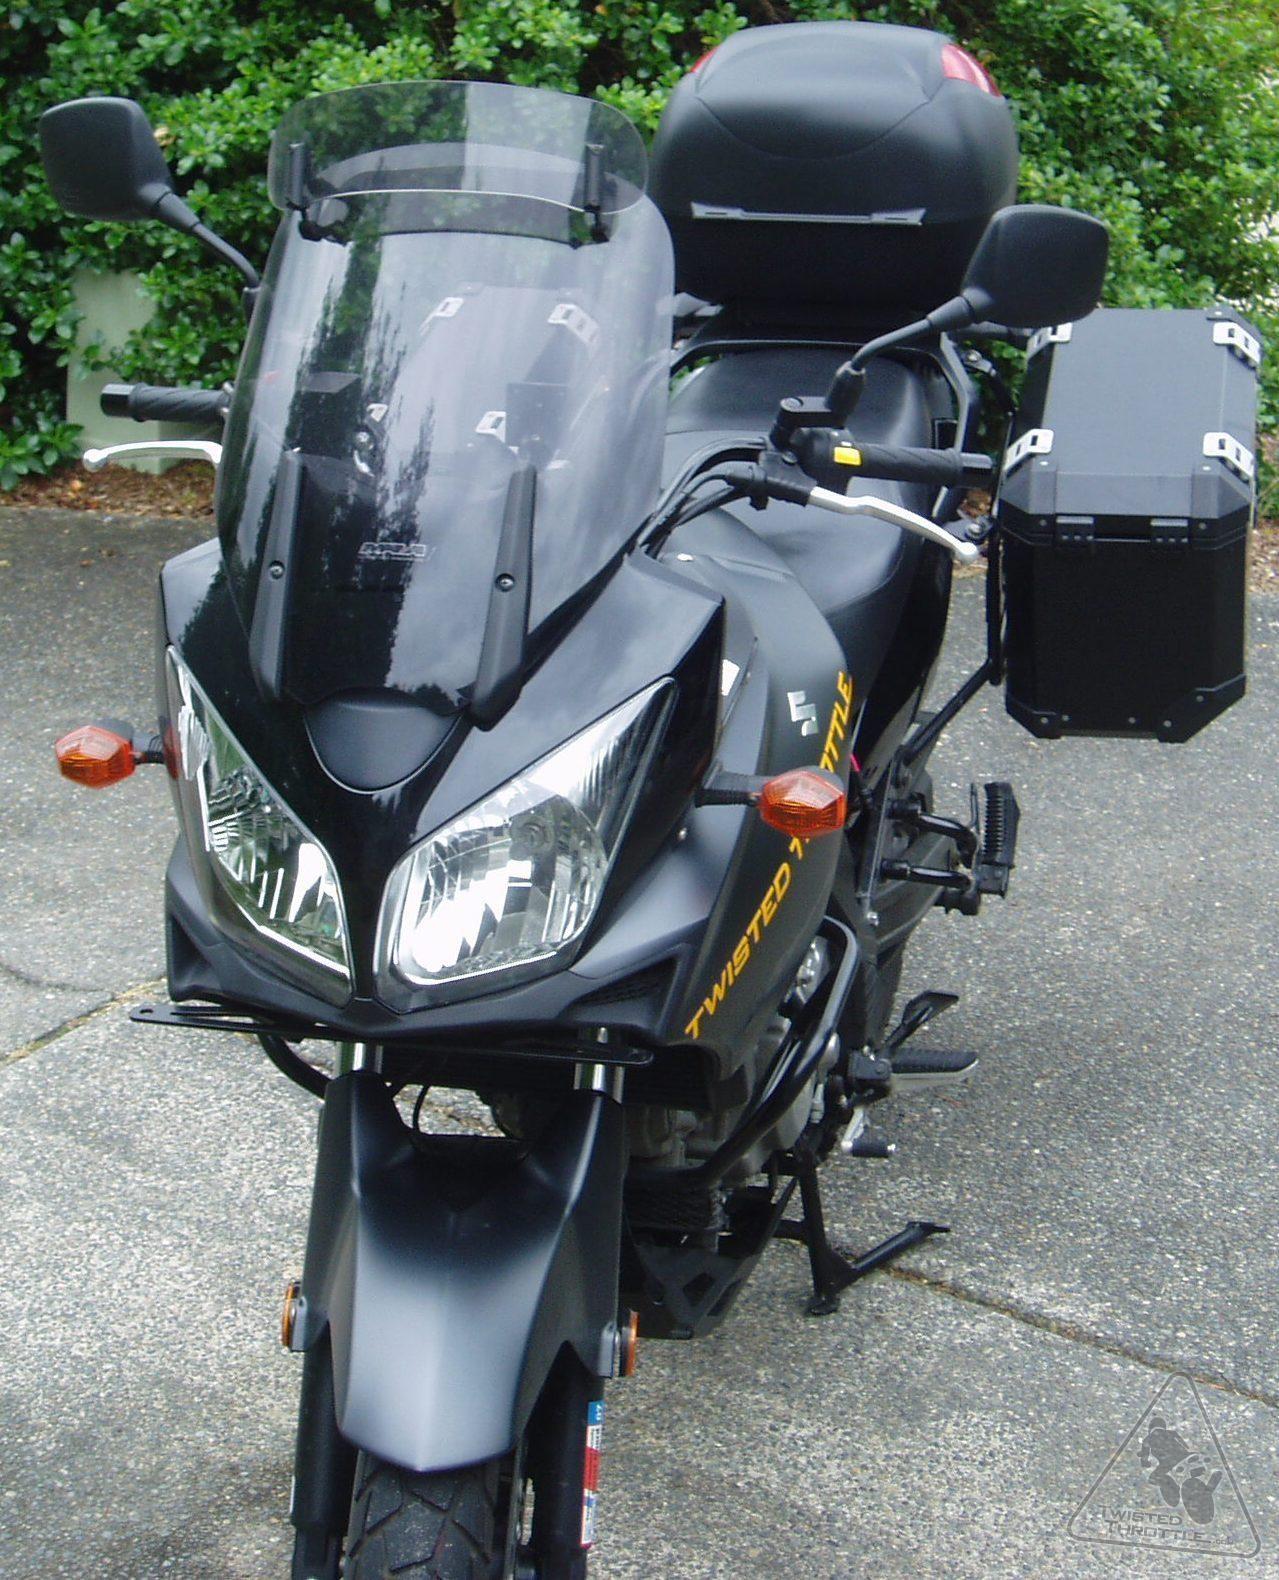 MRA VarioTouringScreen Windshield for Suzuki DL1000 V